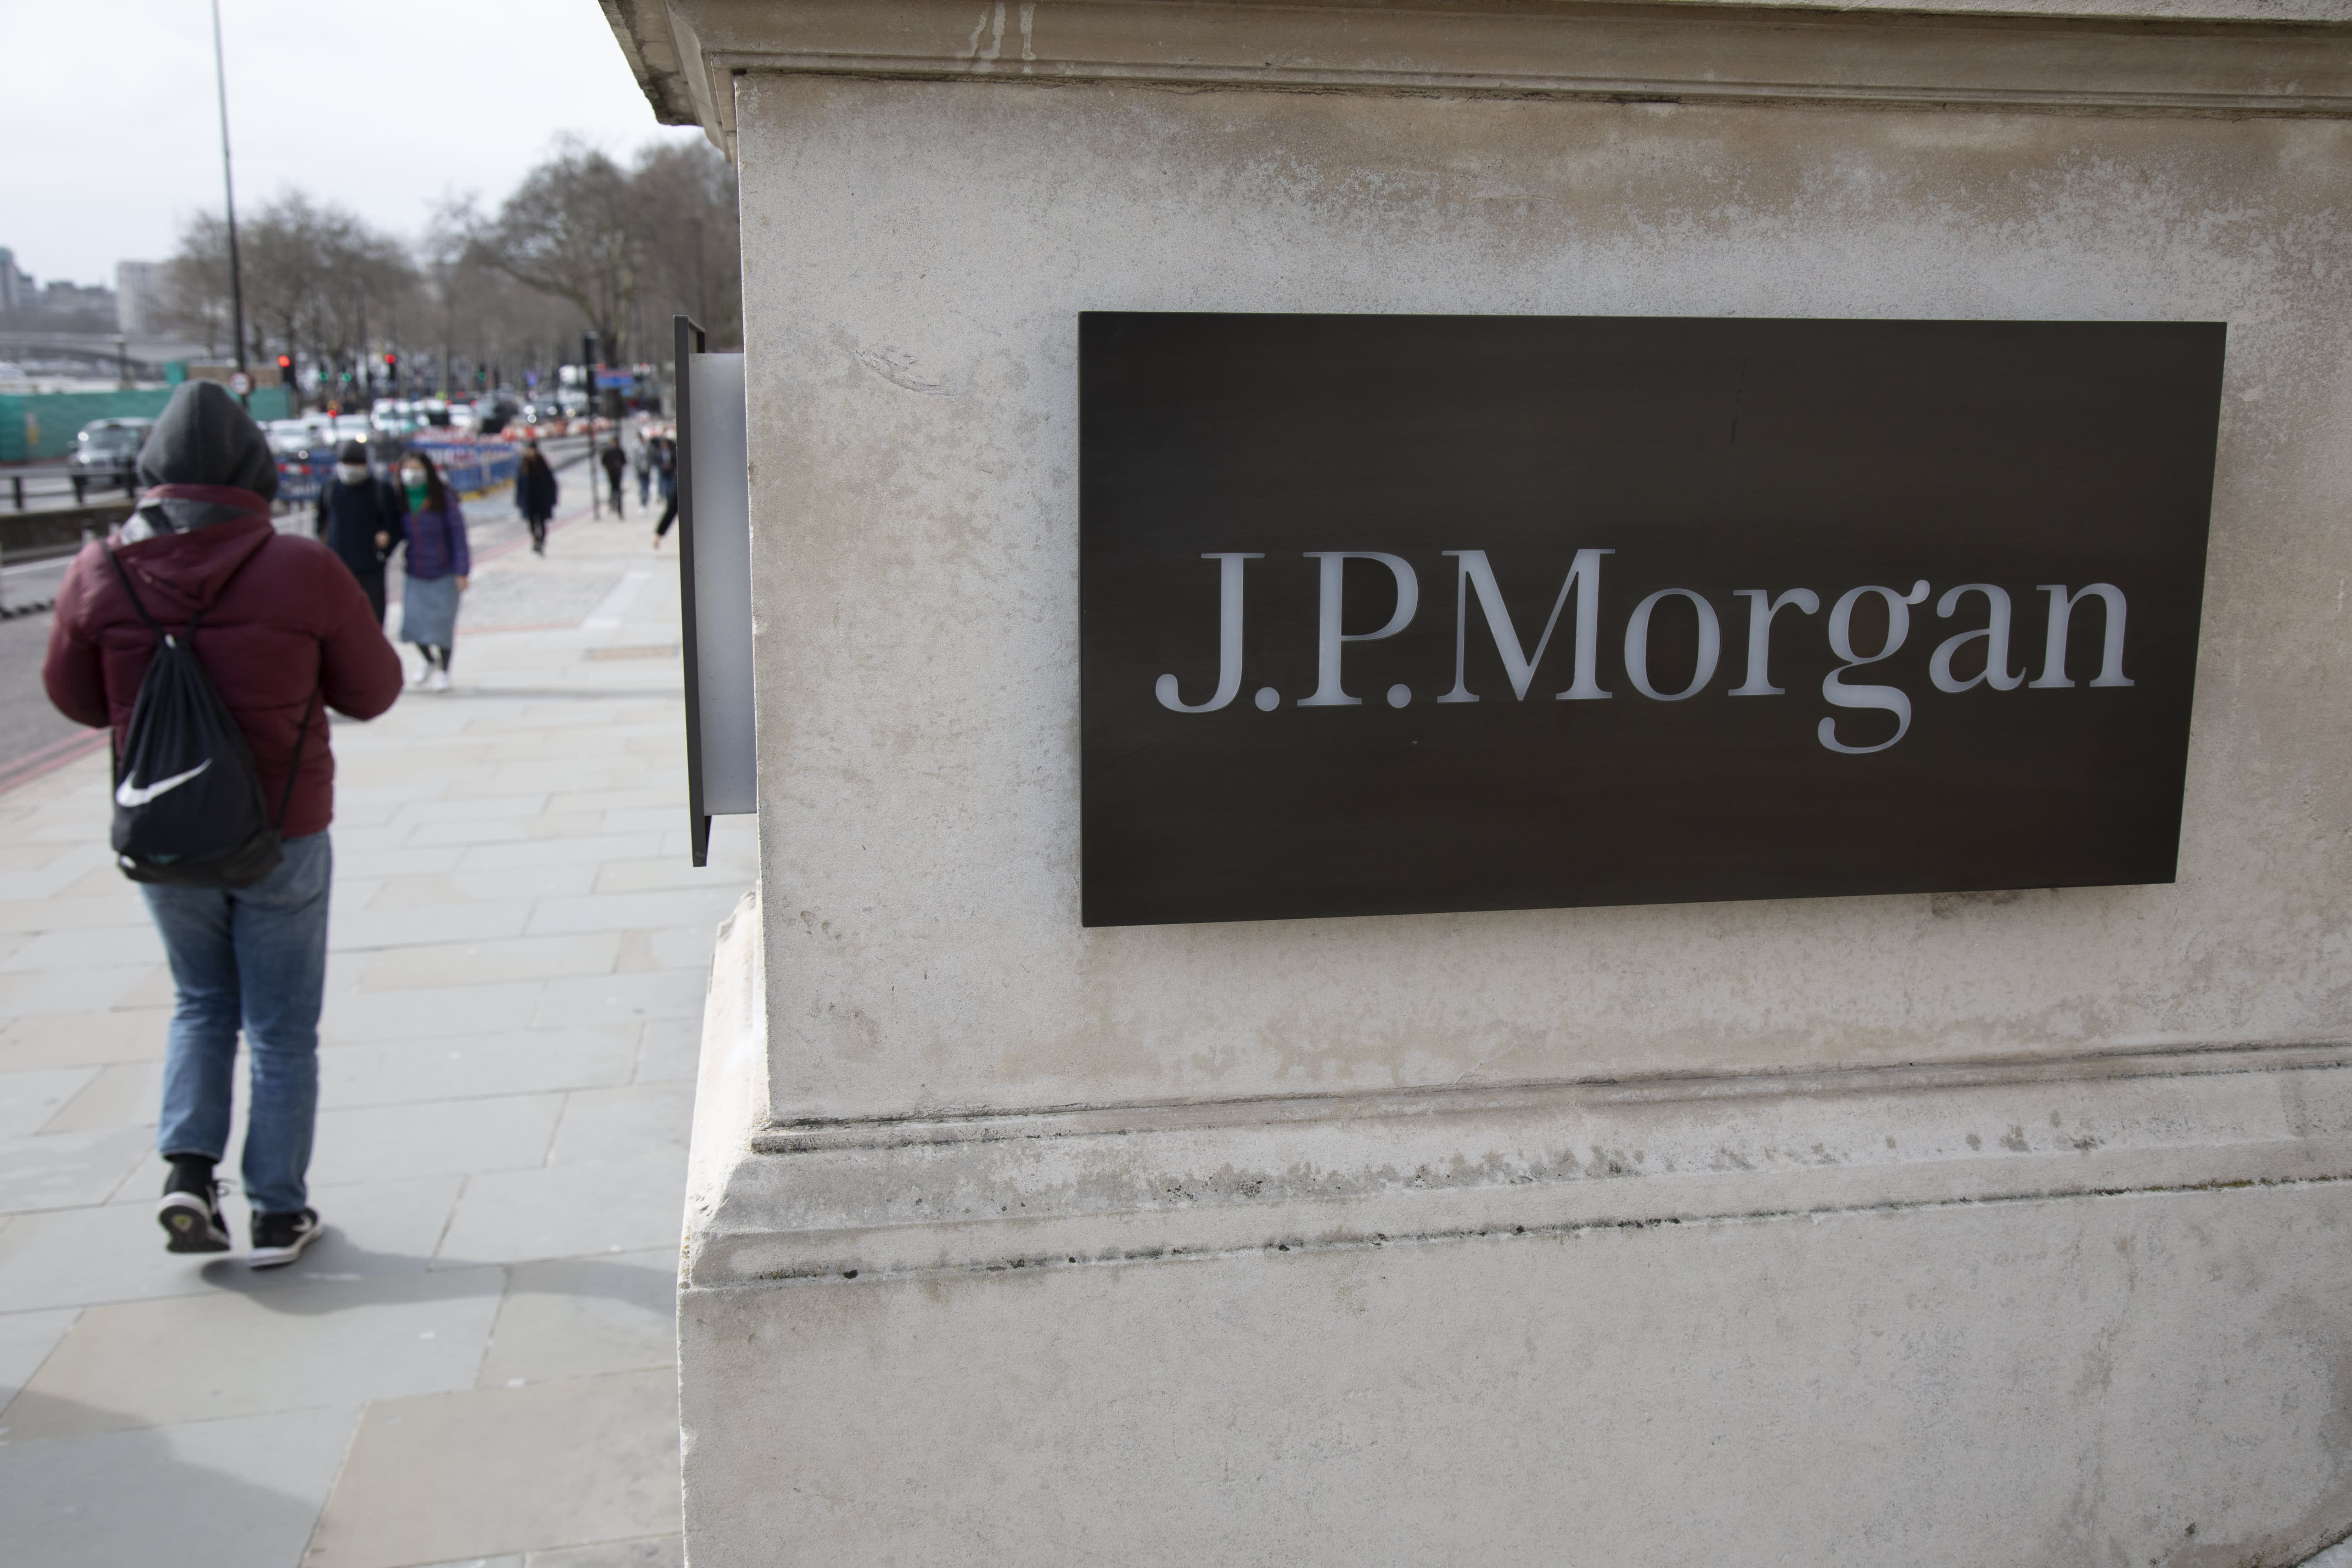 JPMorgan is buying UK robo-advisor Nutmeg to boost overseas retail banking expansion